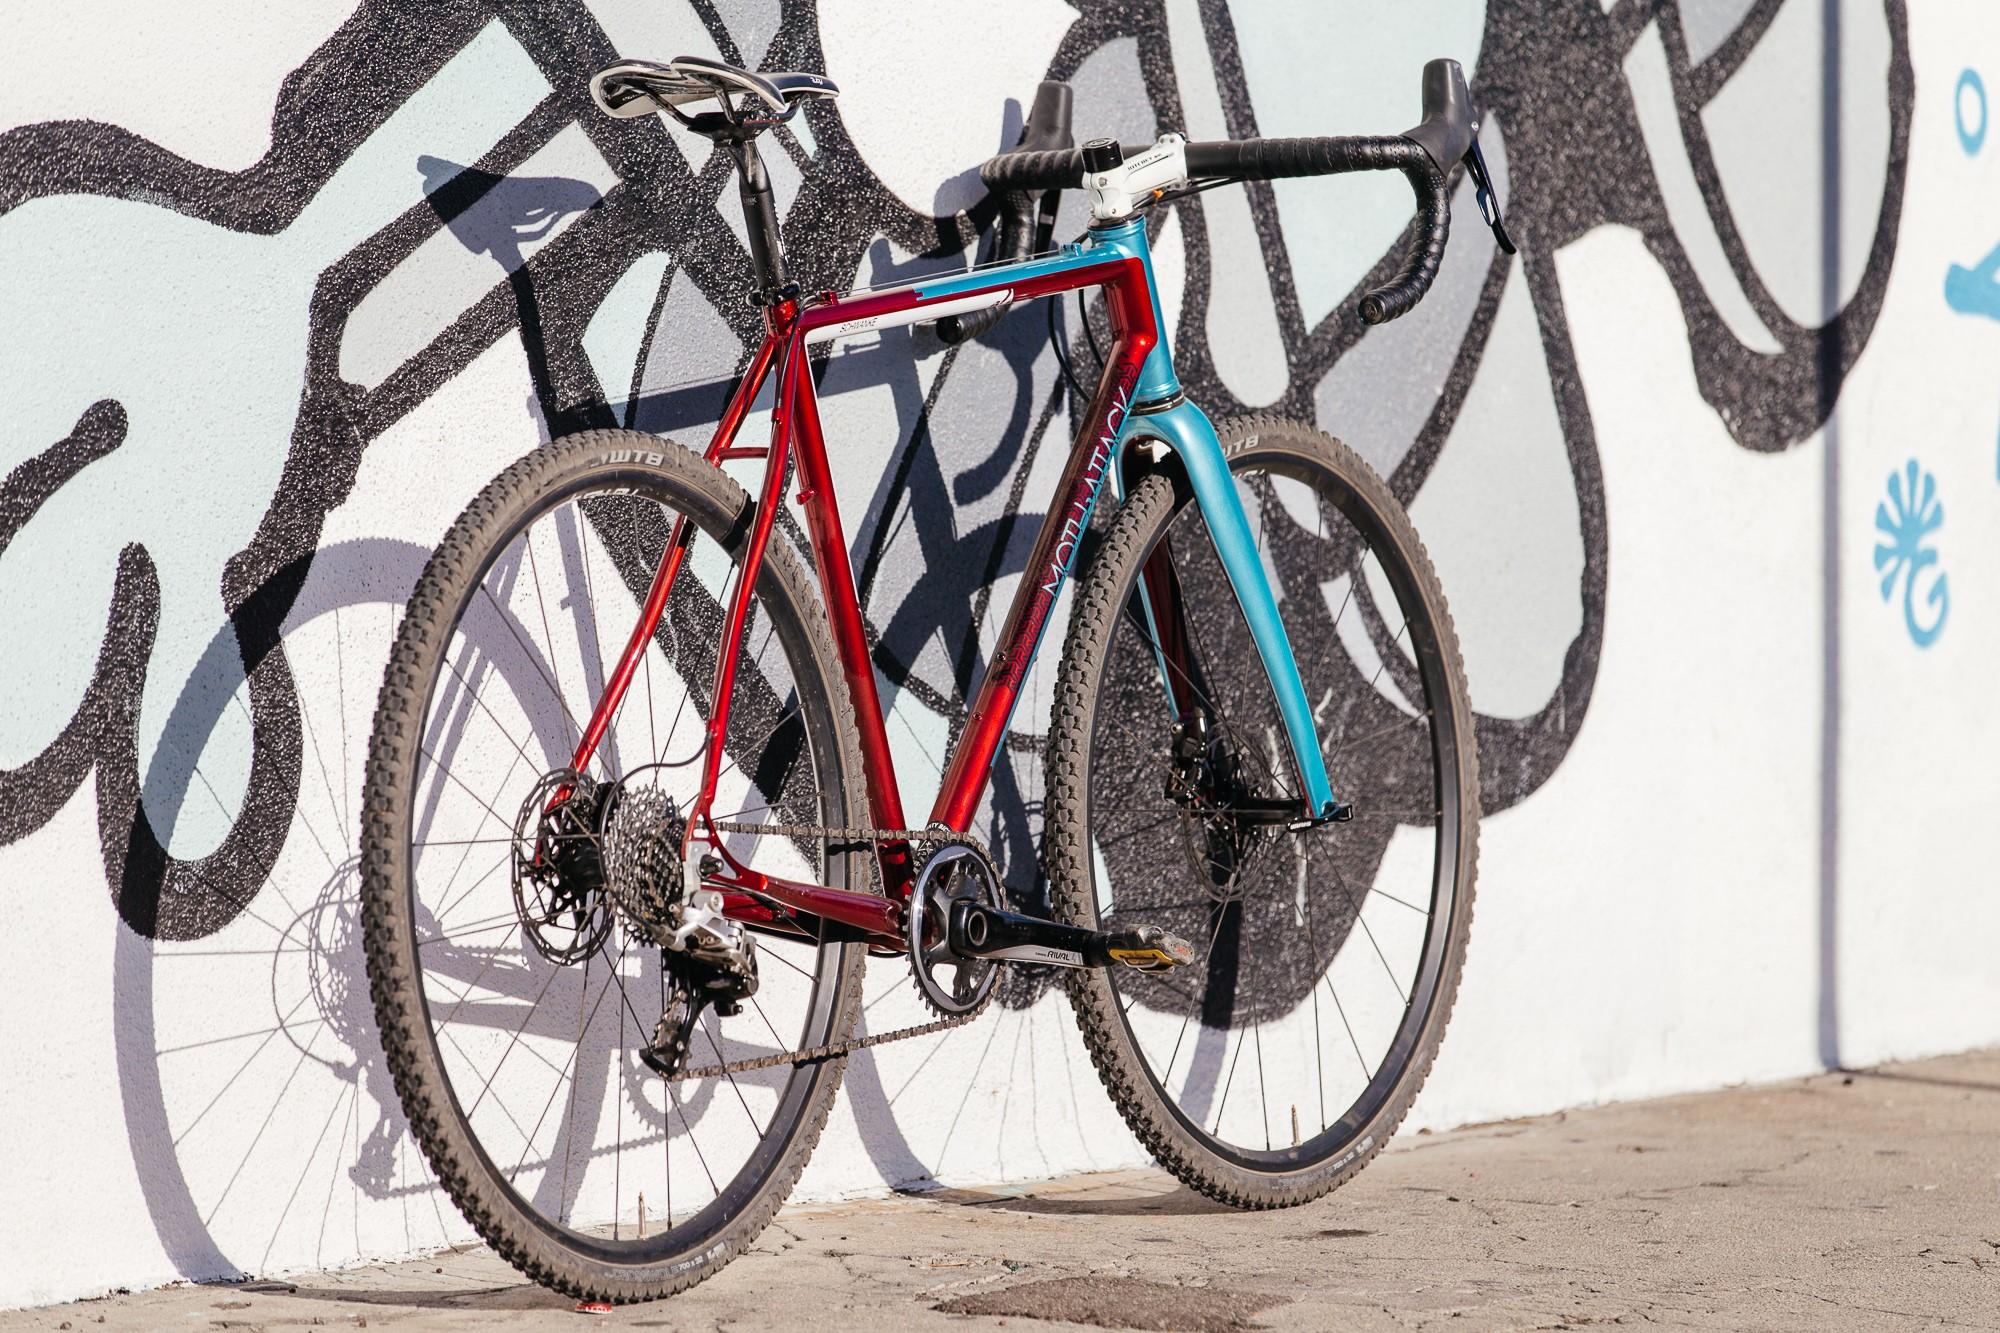 Ericas-Moth-Attack-CX-Team-Bike-18-1335x890@2x.jpg